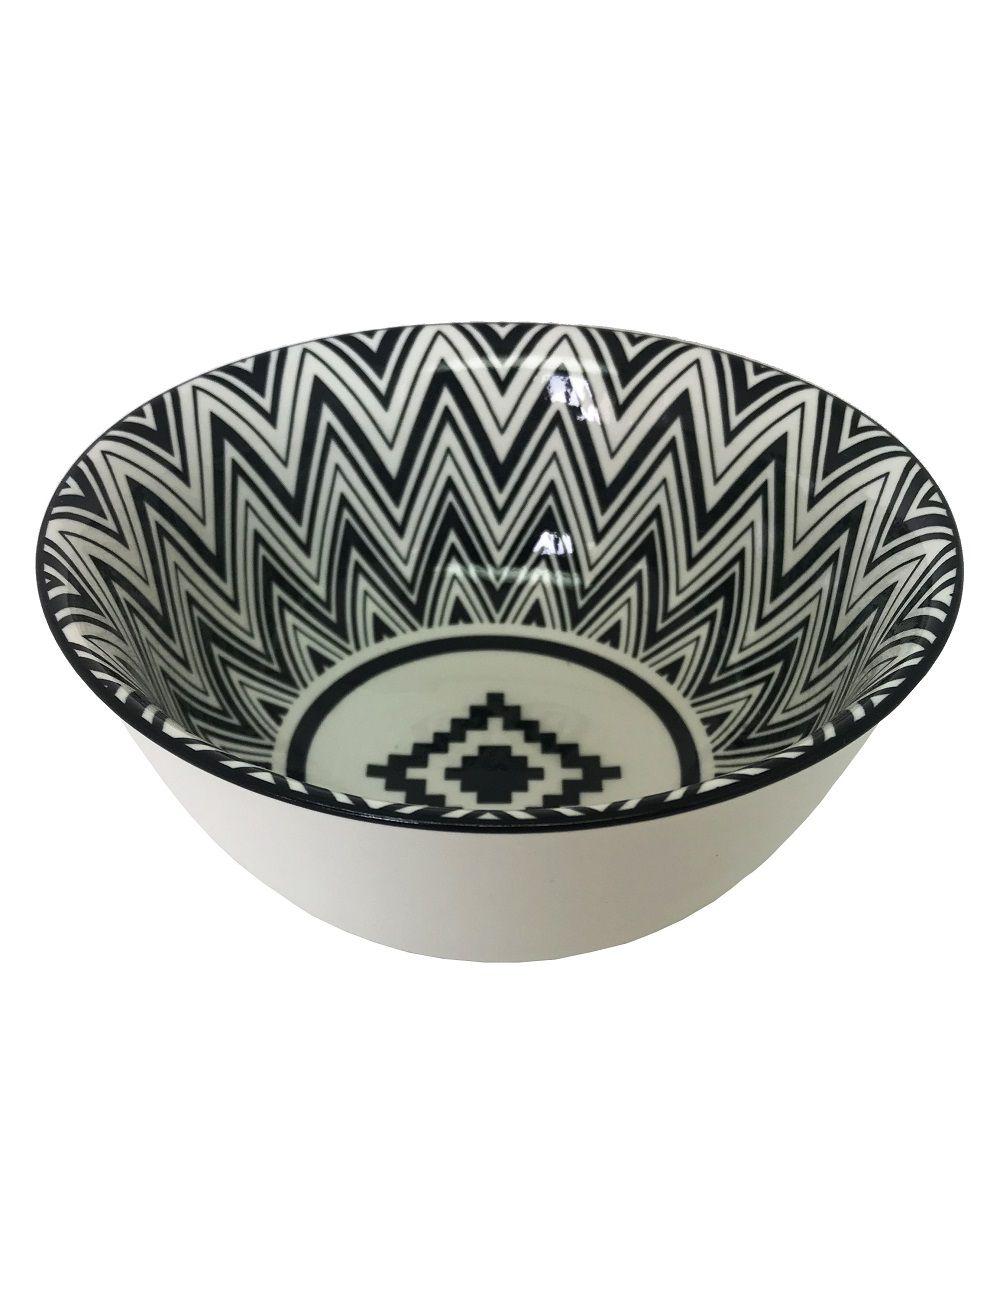 Bowl de Cerâmica Chevron Preto e Branco